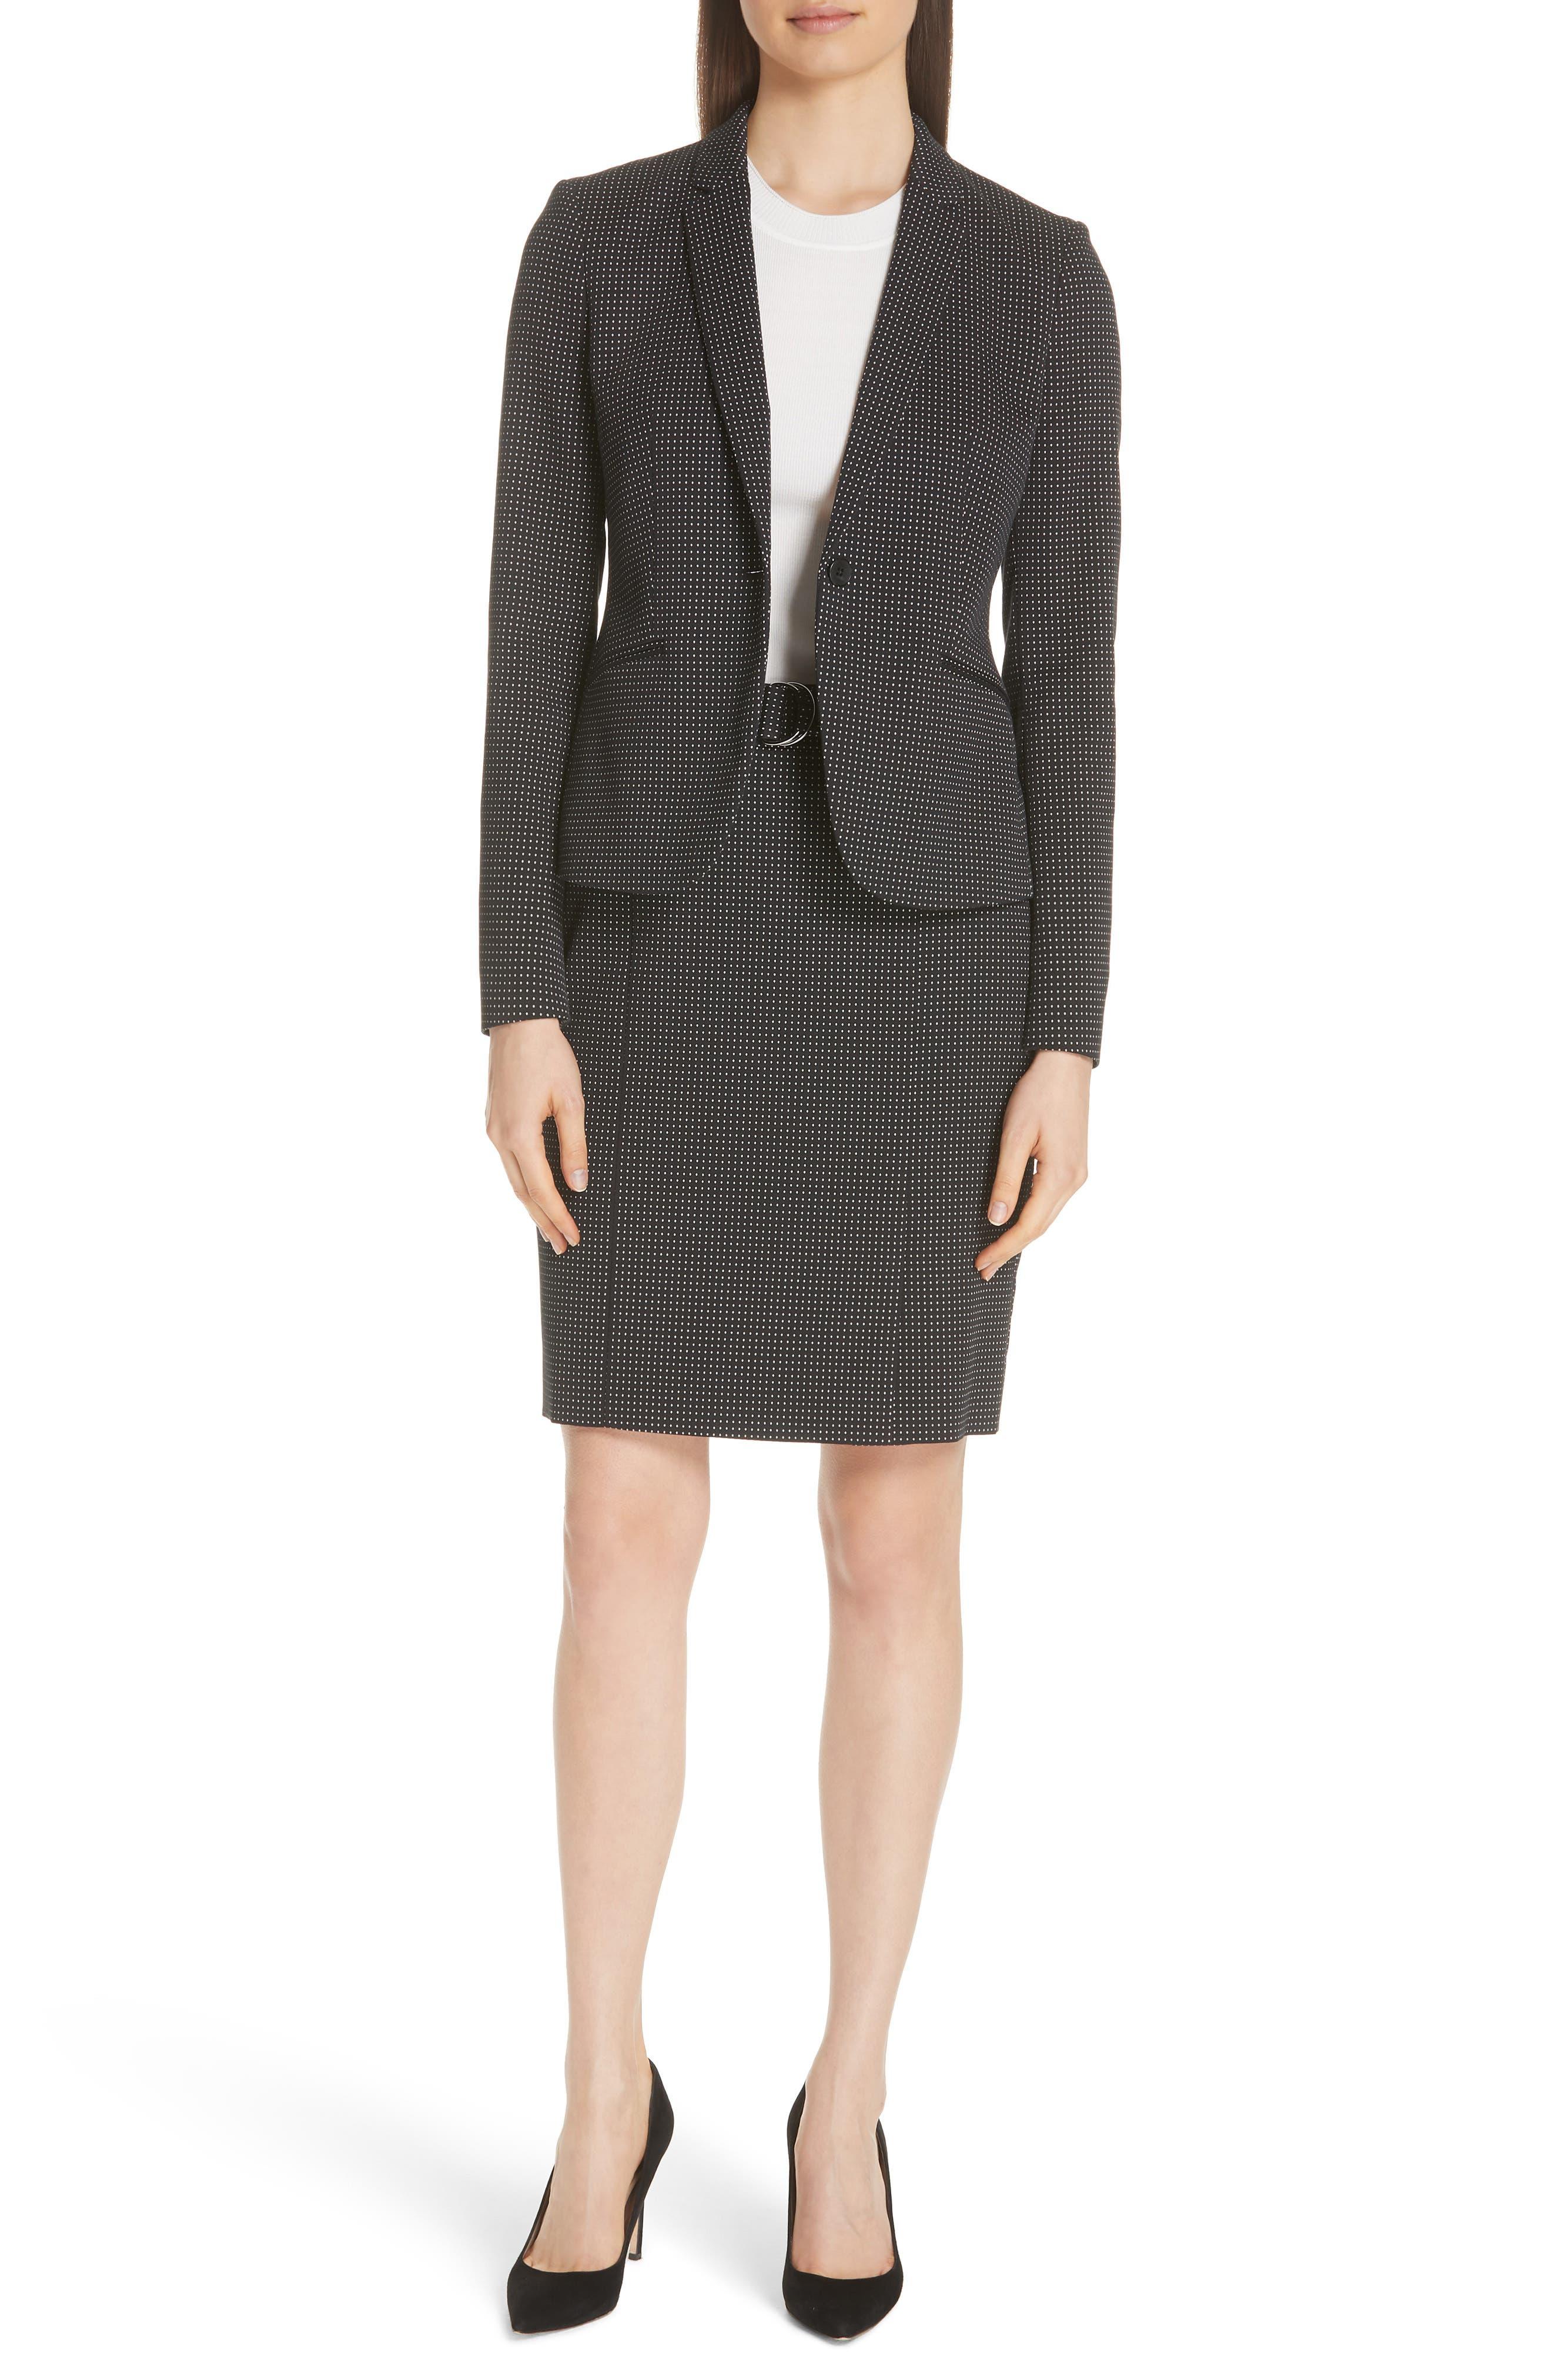 Vumano Dot Dessin Stretch Suit Skirt,                             Alternate thumbnail 7, color,                             BLACK FANTASY